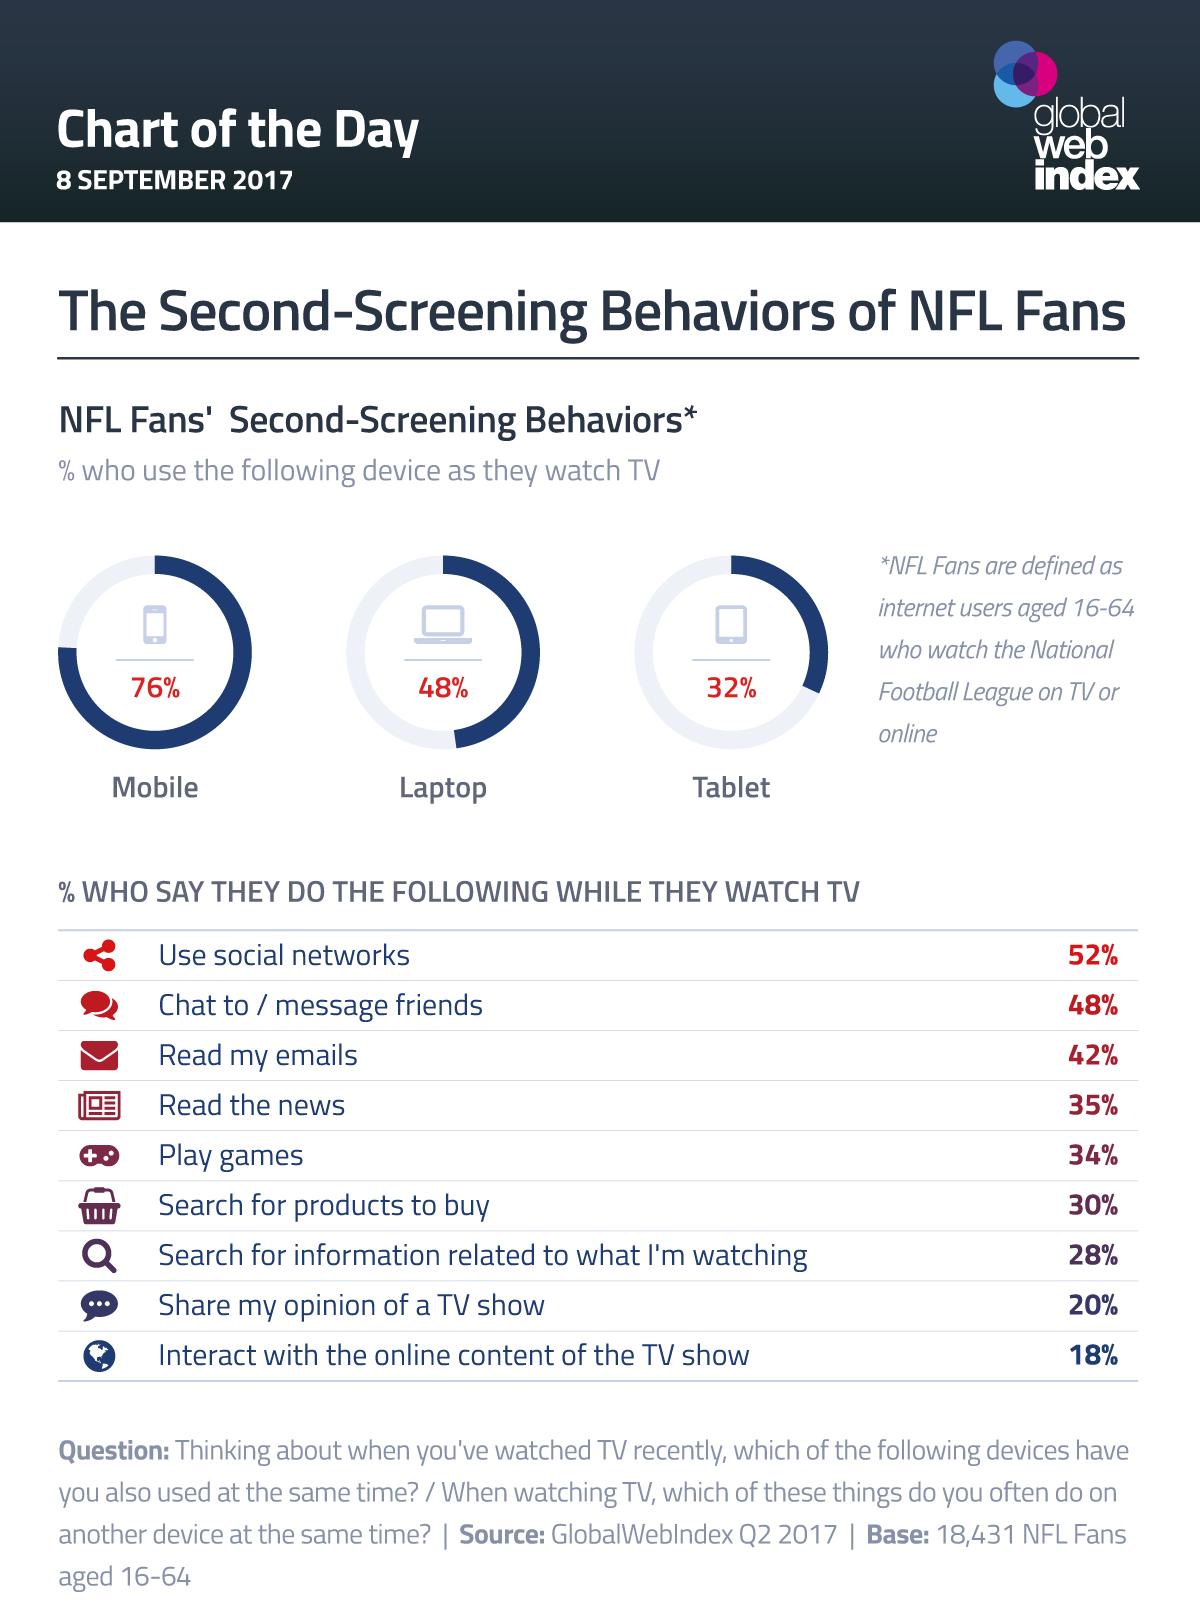 The Second-Screening Behaviors of NFL Fans